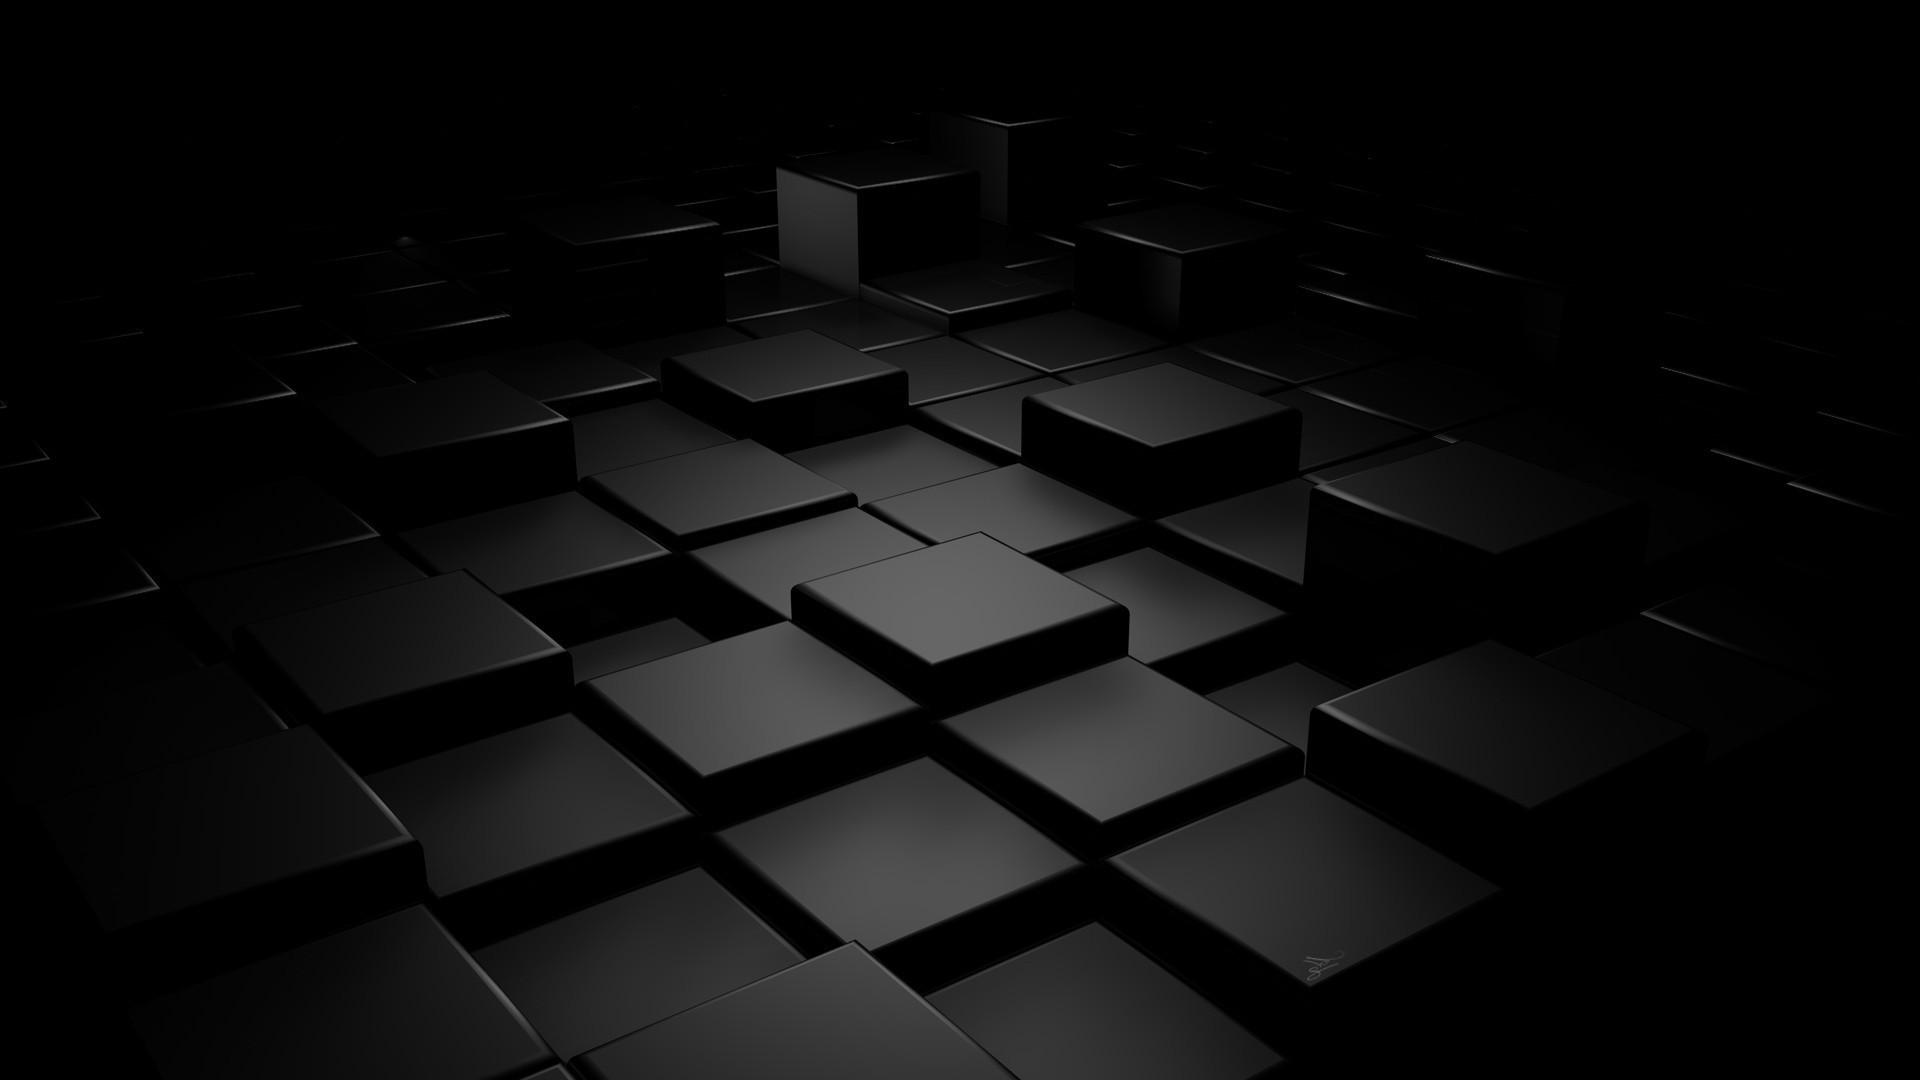 Black cubes HD Wallpaper 1920x1080 1920x1080